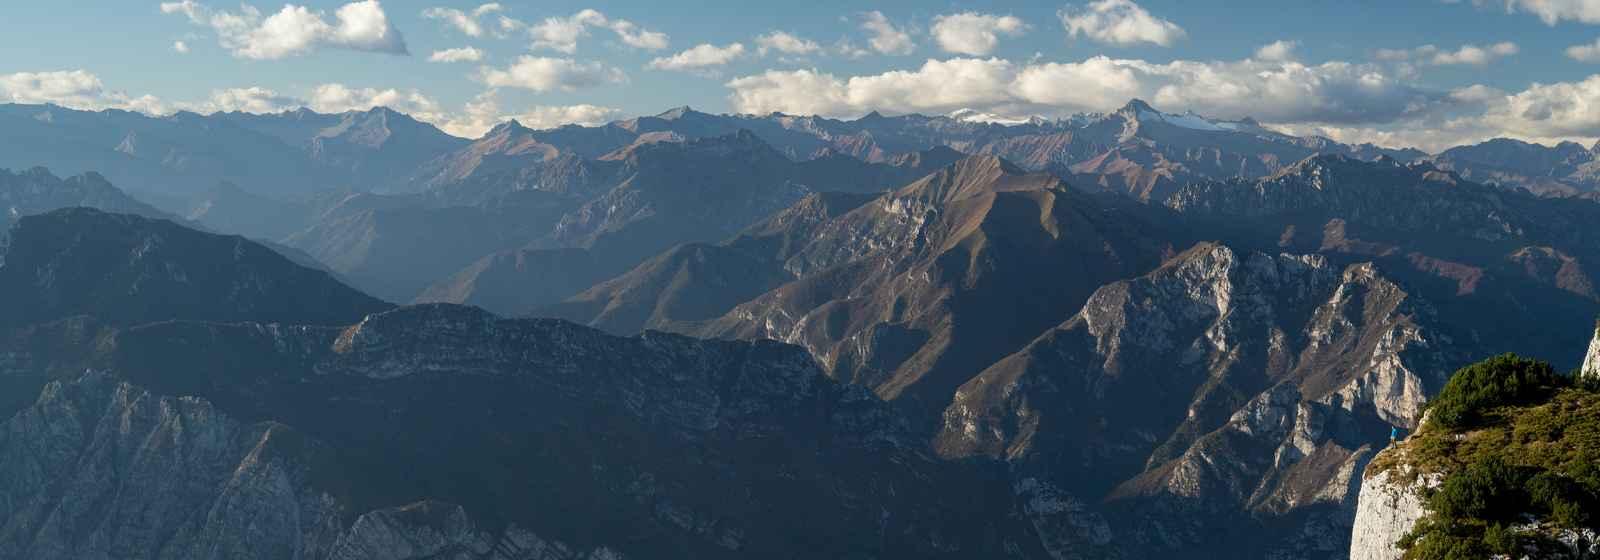 Gardasee, Trentino, Italien.